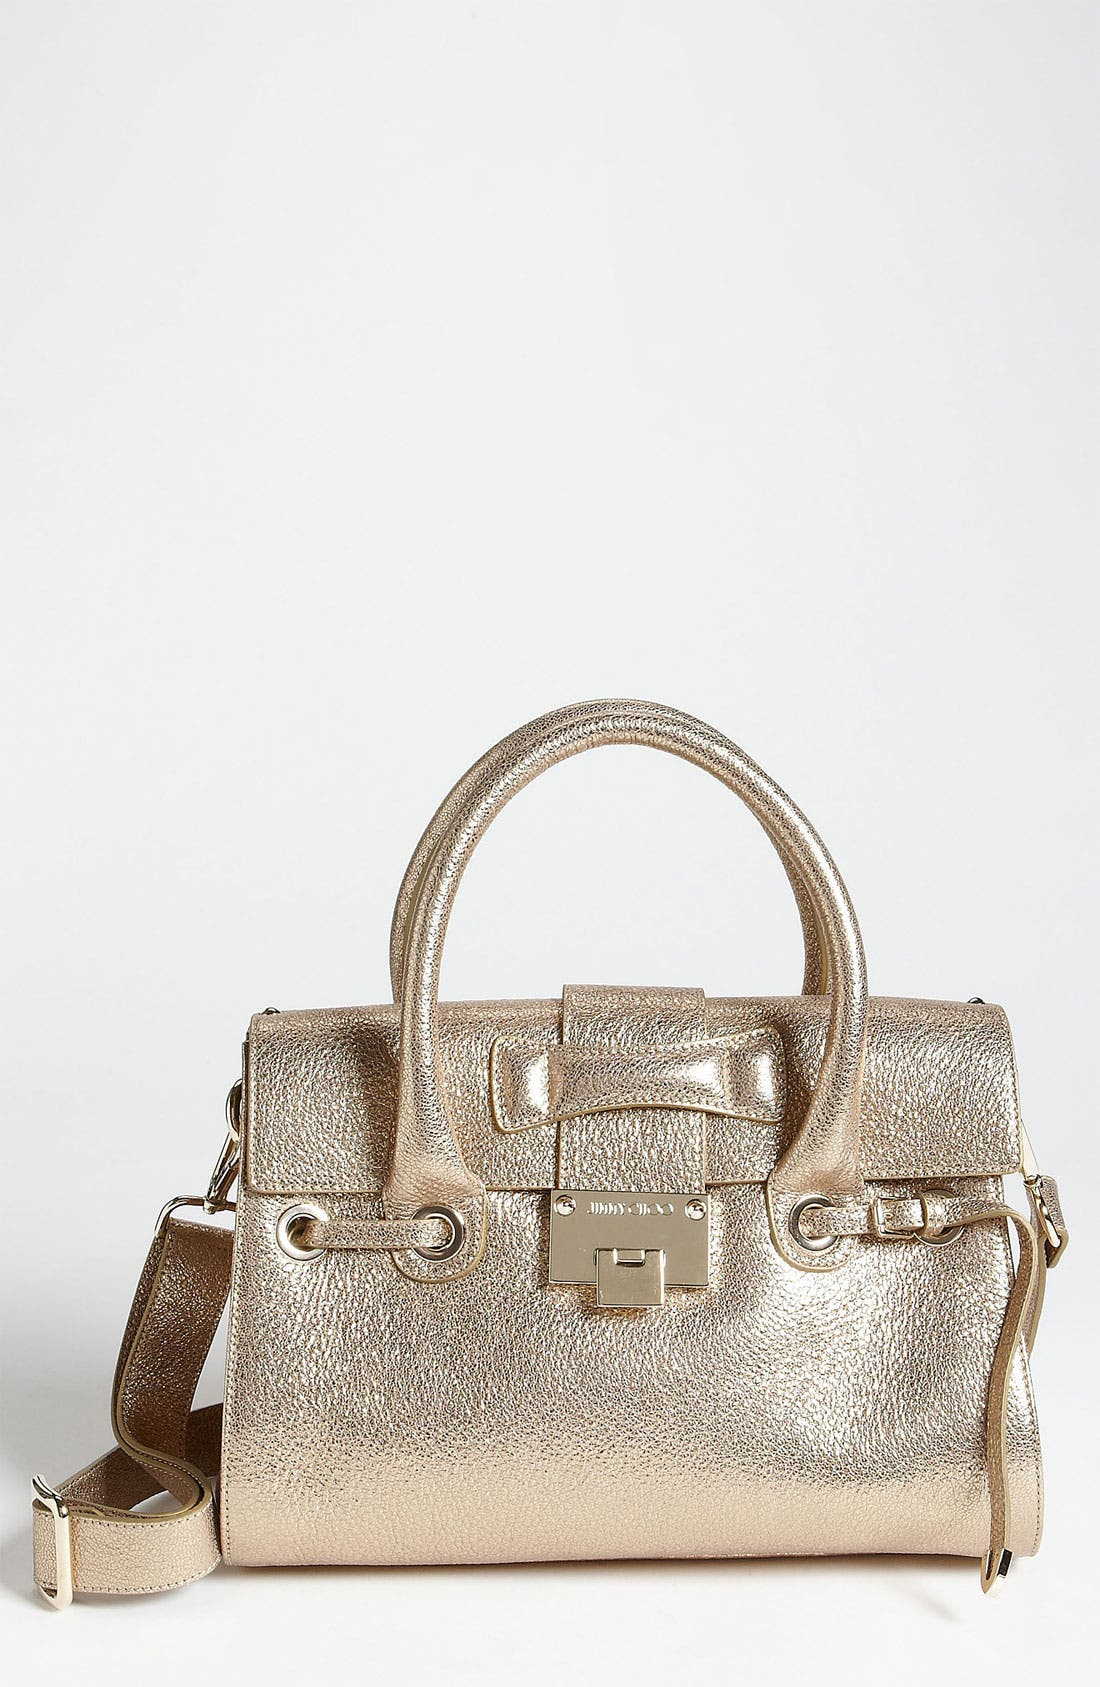 Alternate Image 1 Selected - Jimmy Choo 'Rosalie' Glitter Leather Satchel